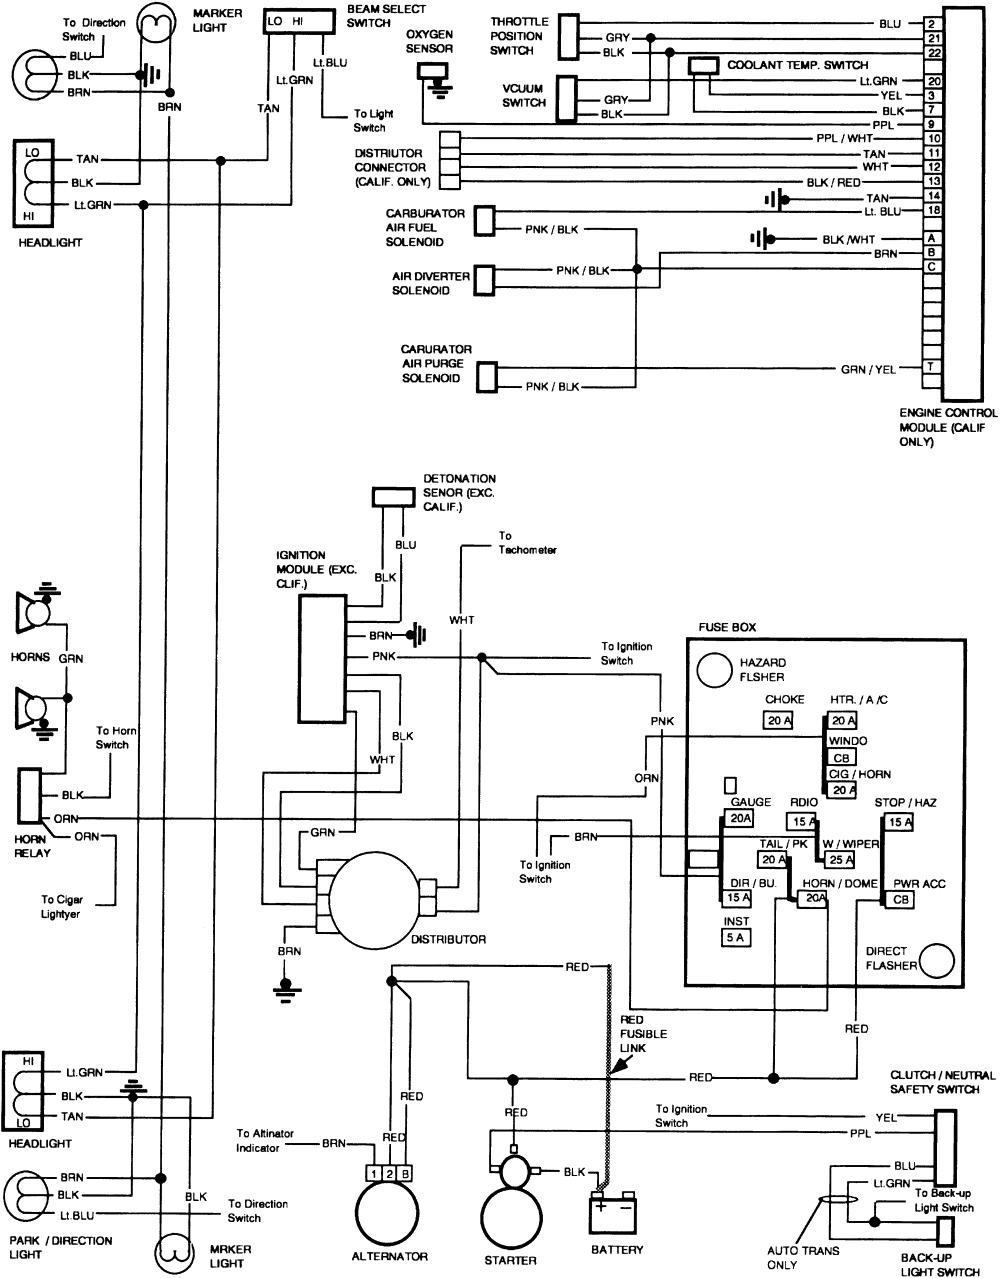 free wiring diagram 1991 gmc sierra wiring schematic for 83 k10 free wiring diagram 1991 gmc